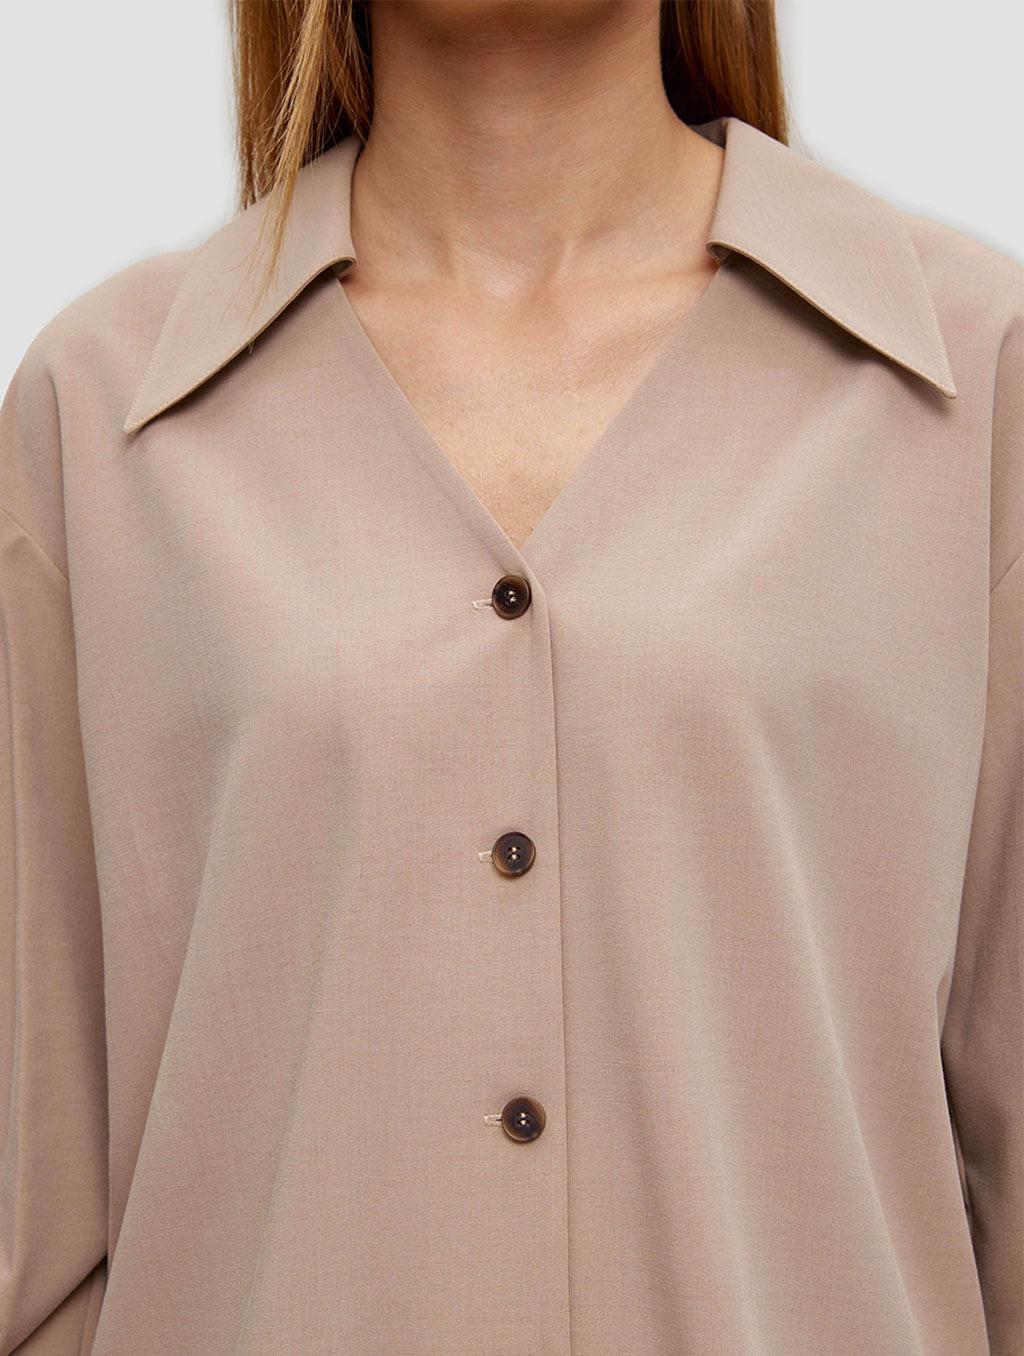 buttoned lantern sleeve shirt - detail1- Light Taupe